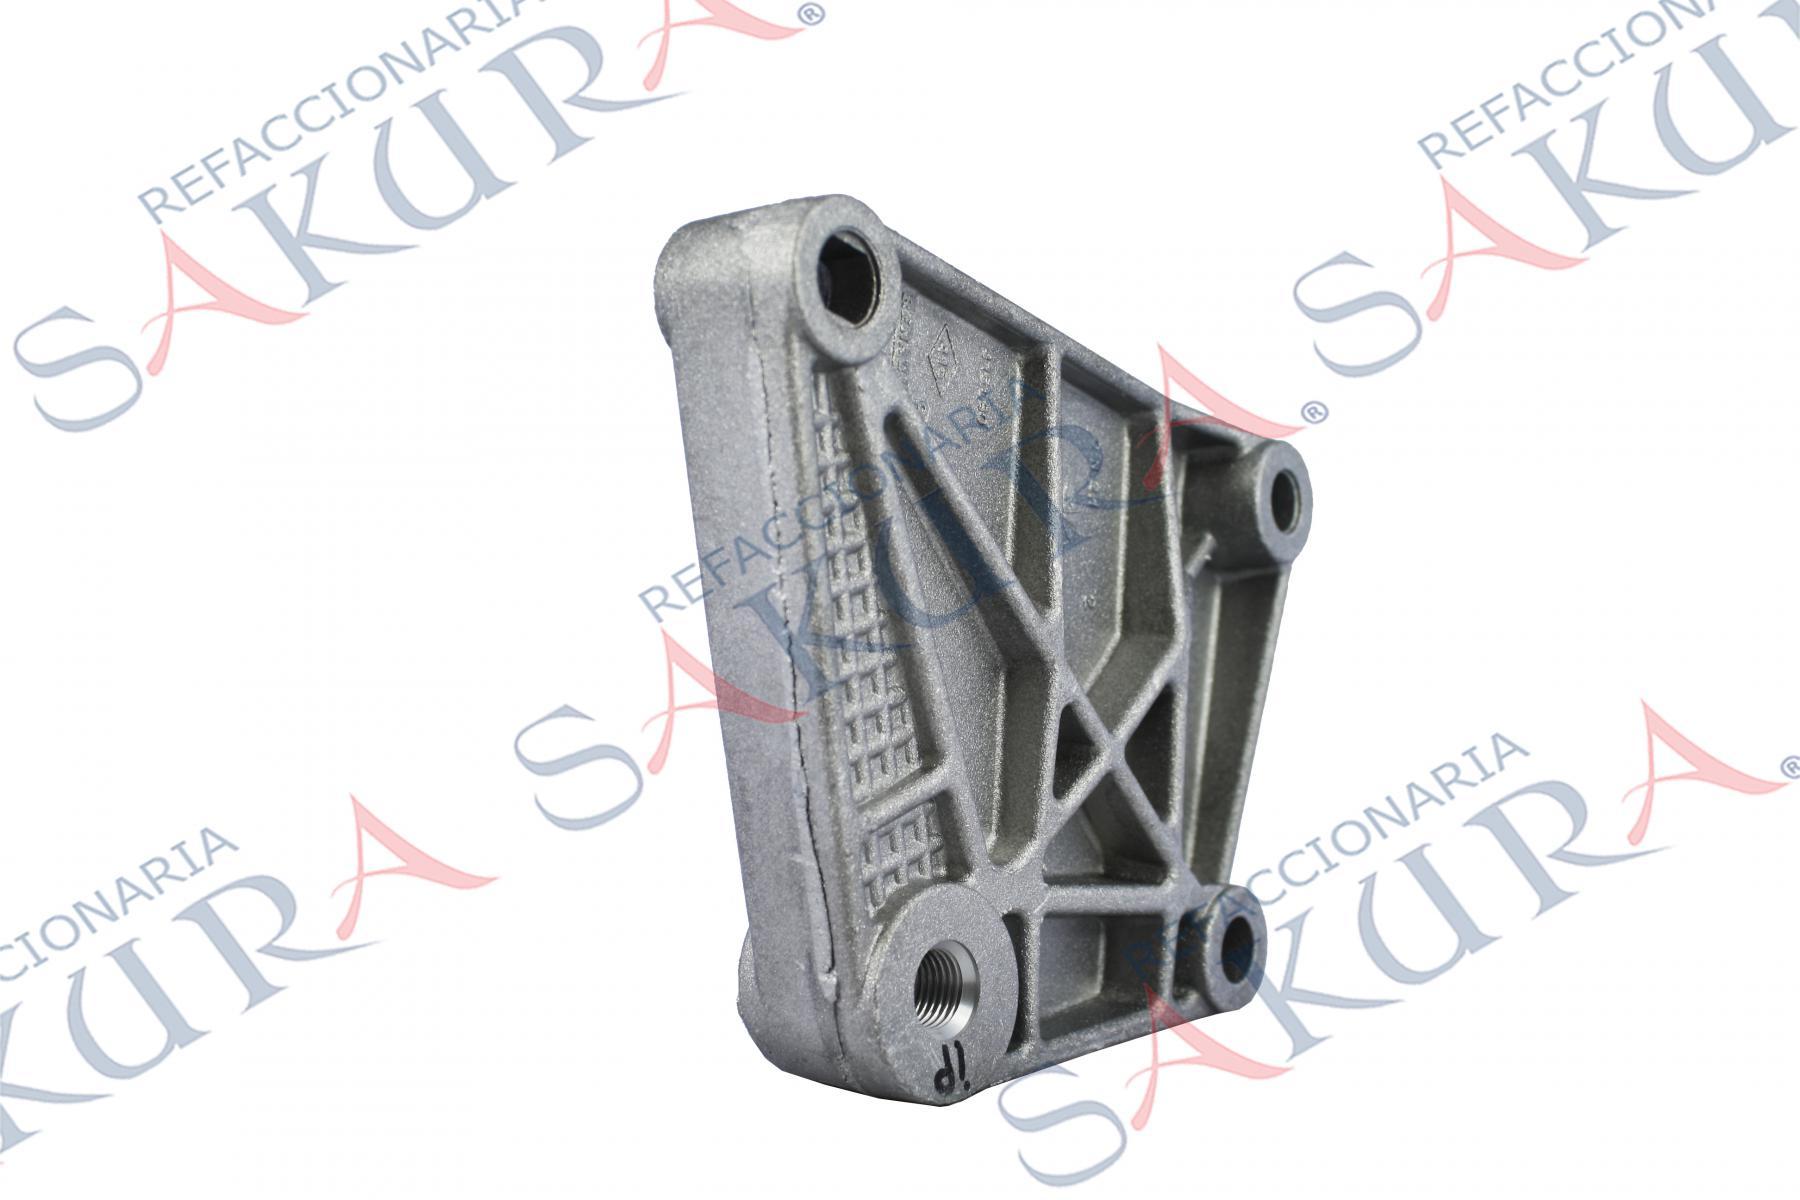 1131200QAB, Base Soporte Caja Velocidades Inferior-Izquierdo (Nissan)